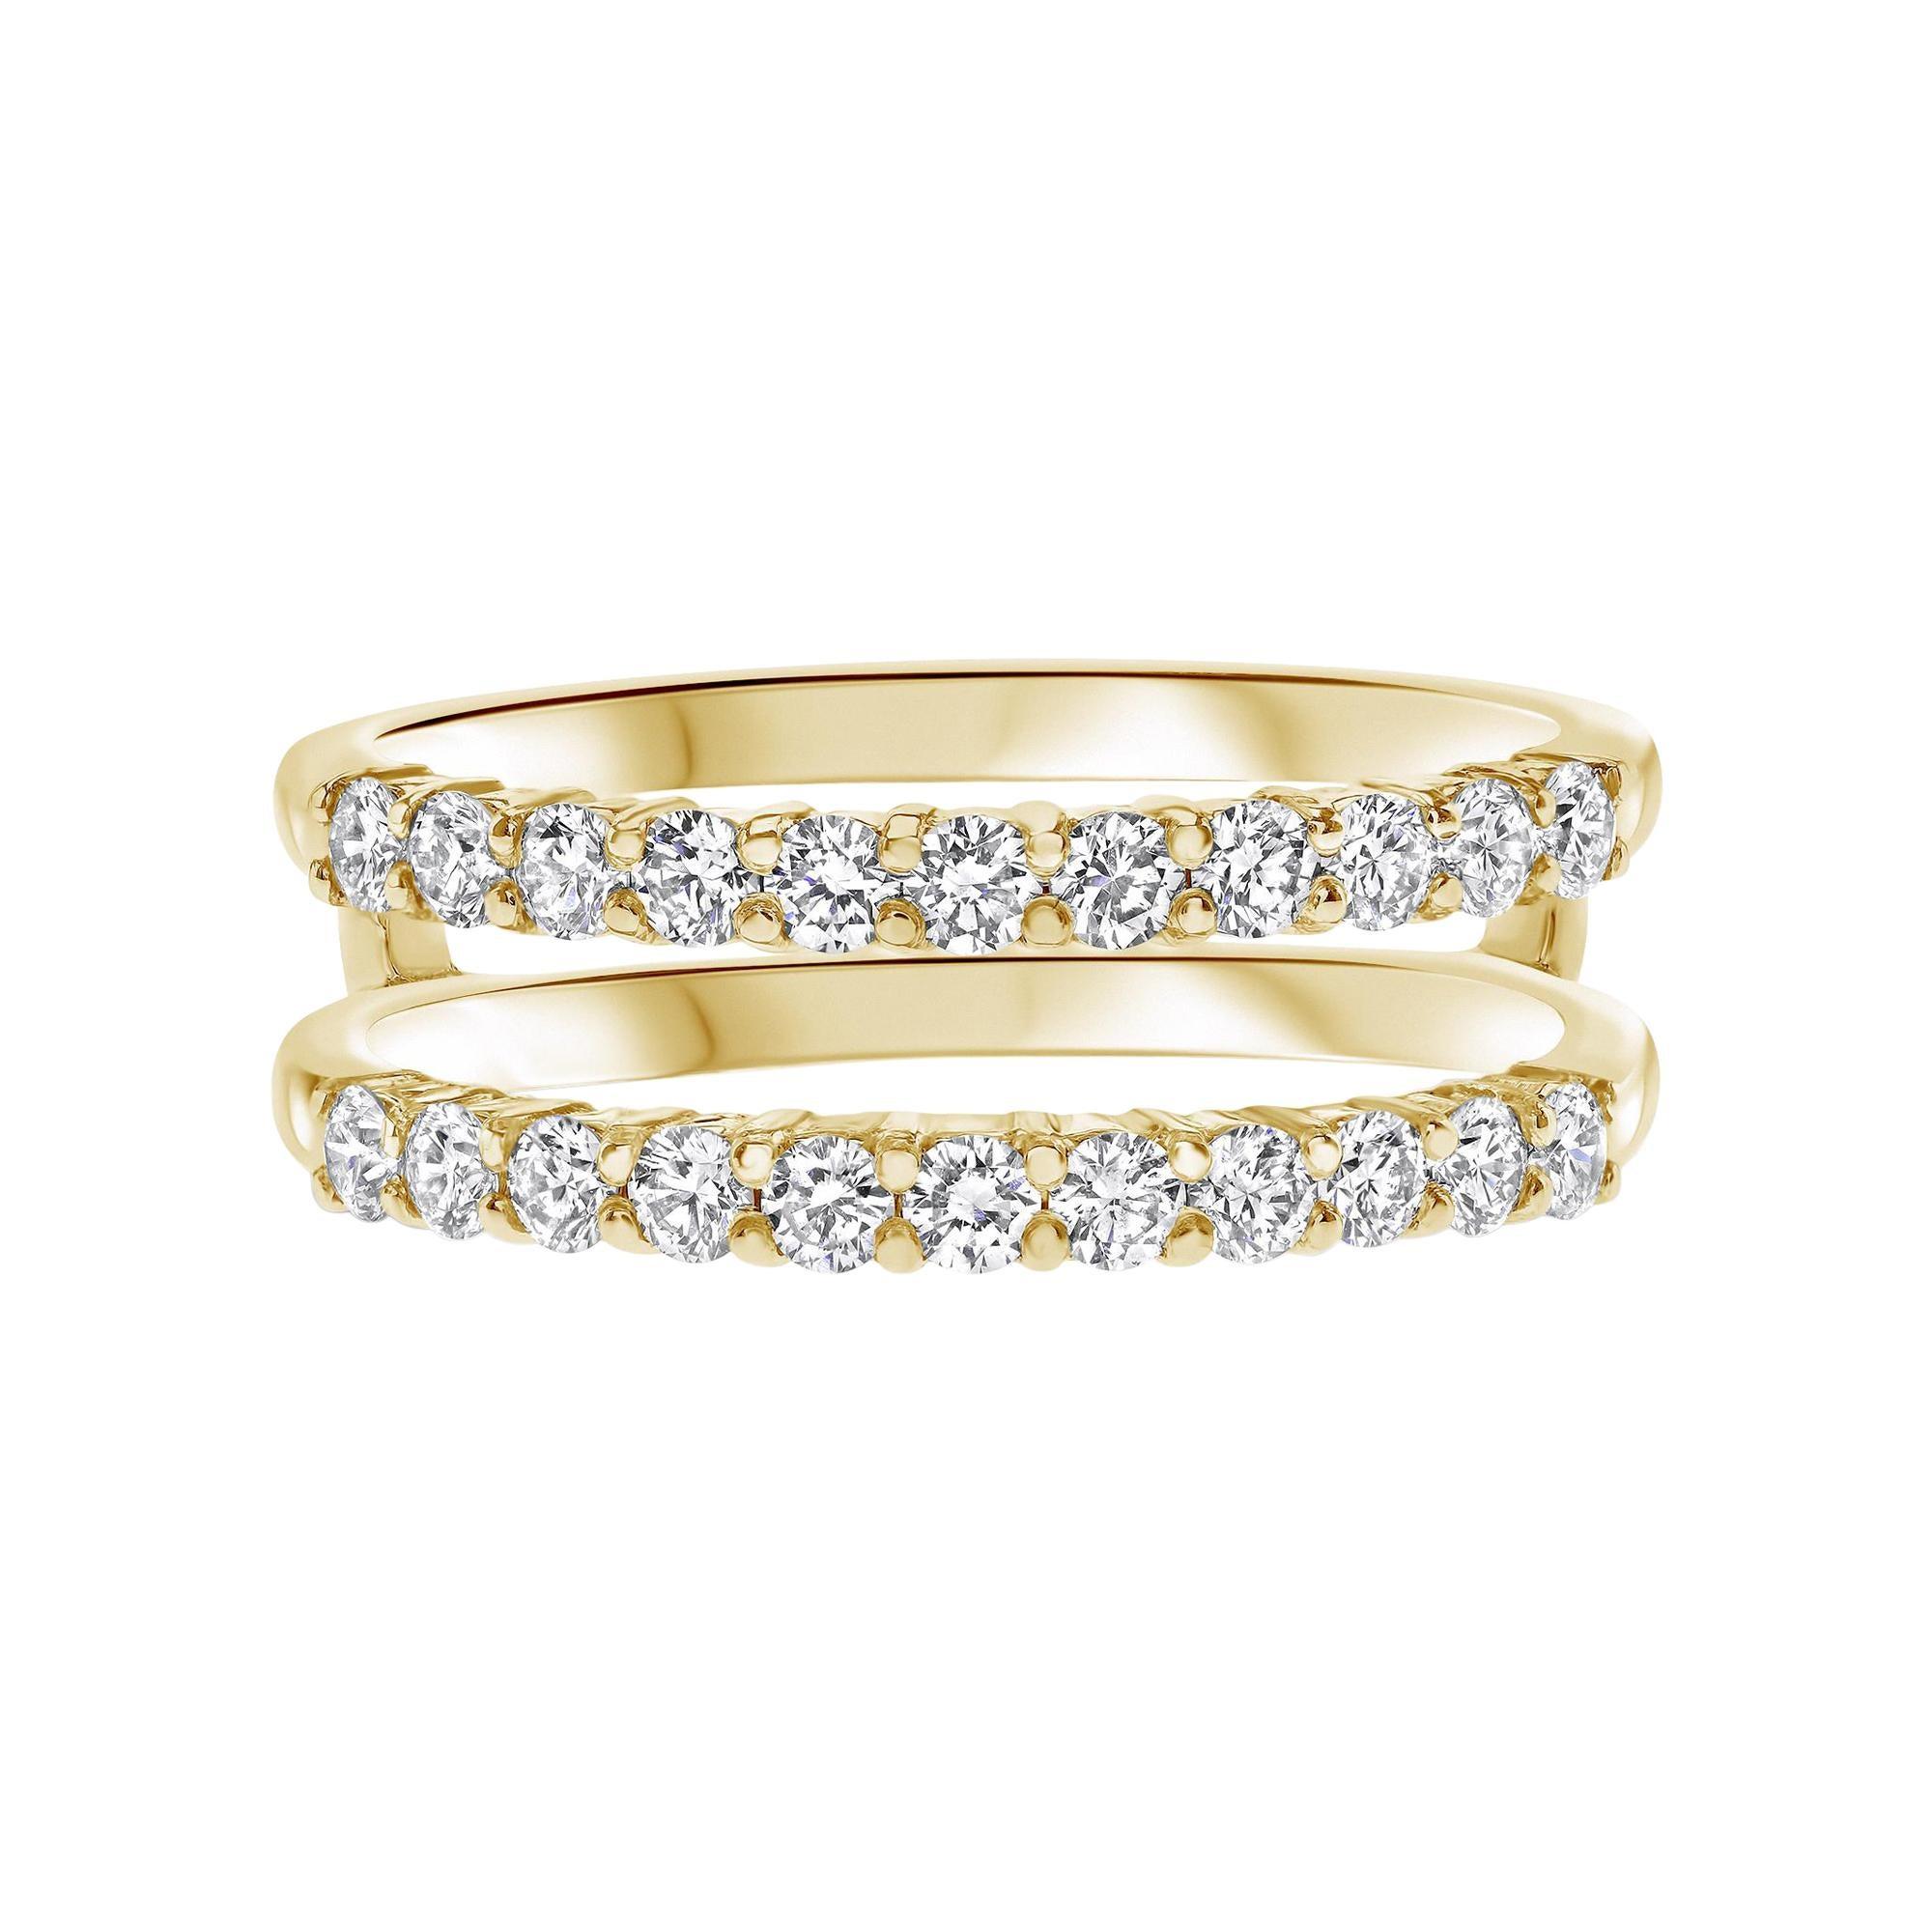 0.60 Carat Diamond Double Band Wedding Ring in 14K Yellow Gold, Shlomit Rogel